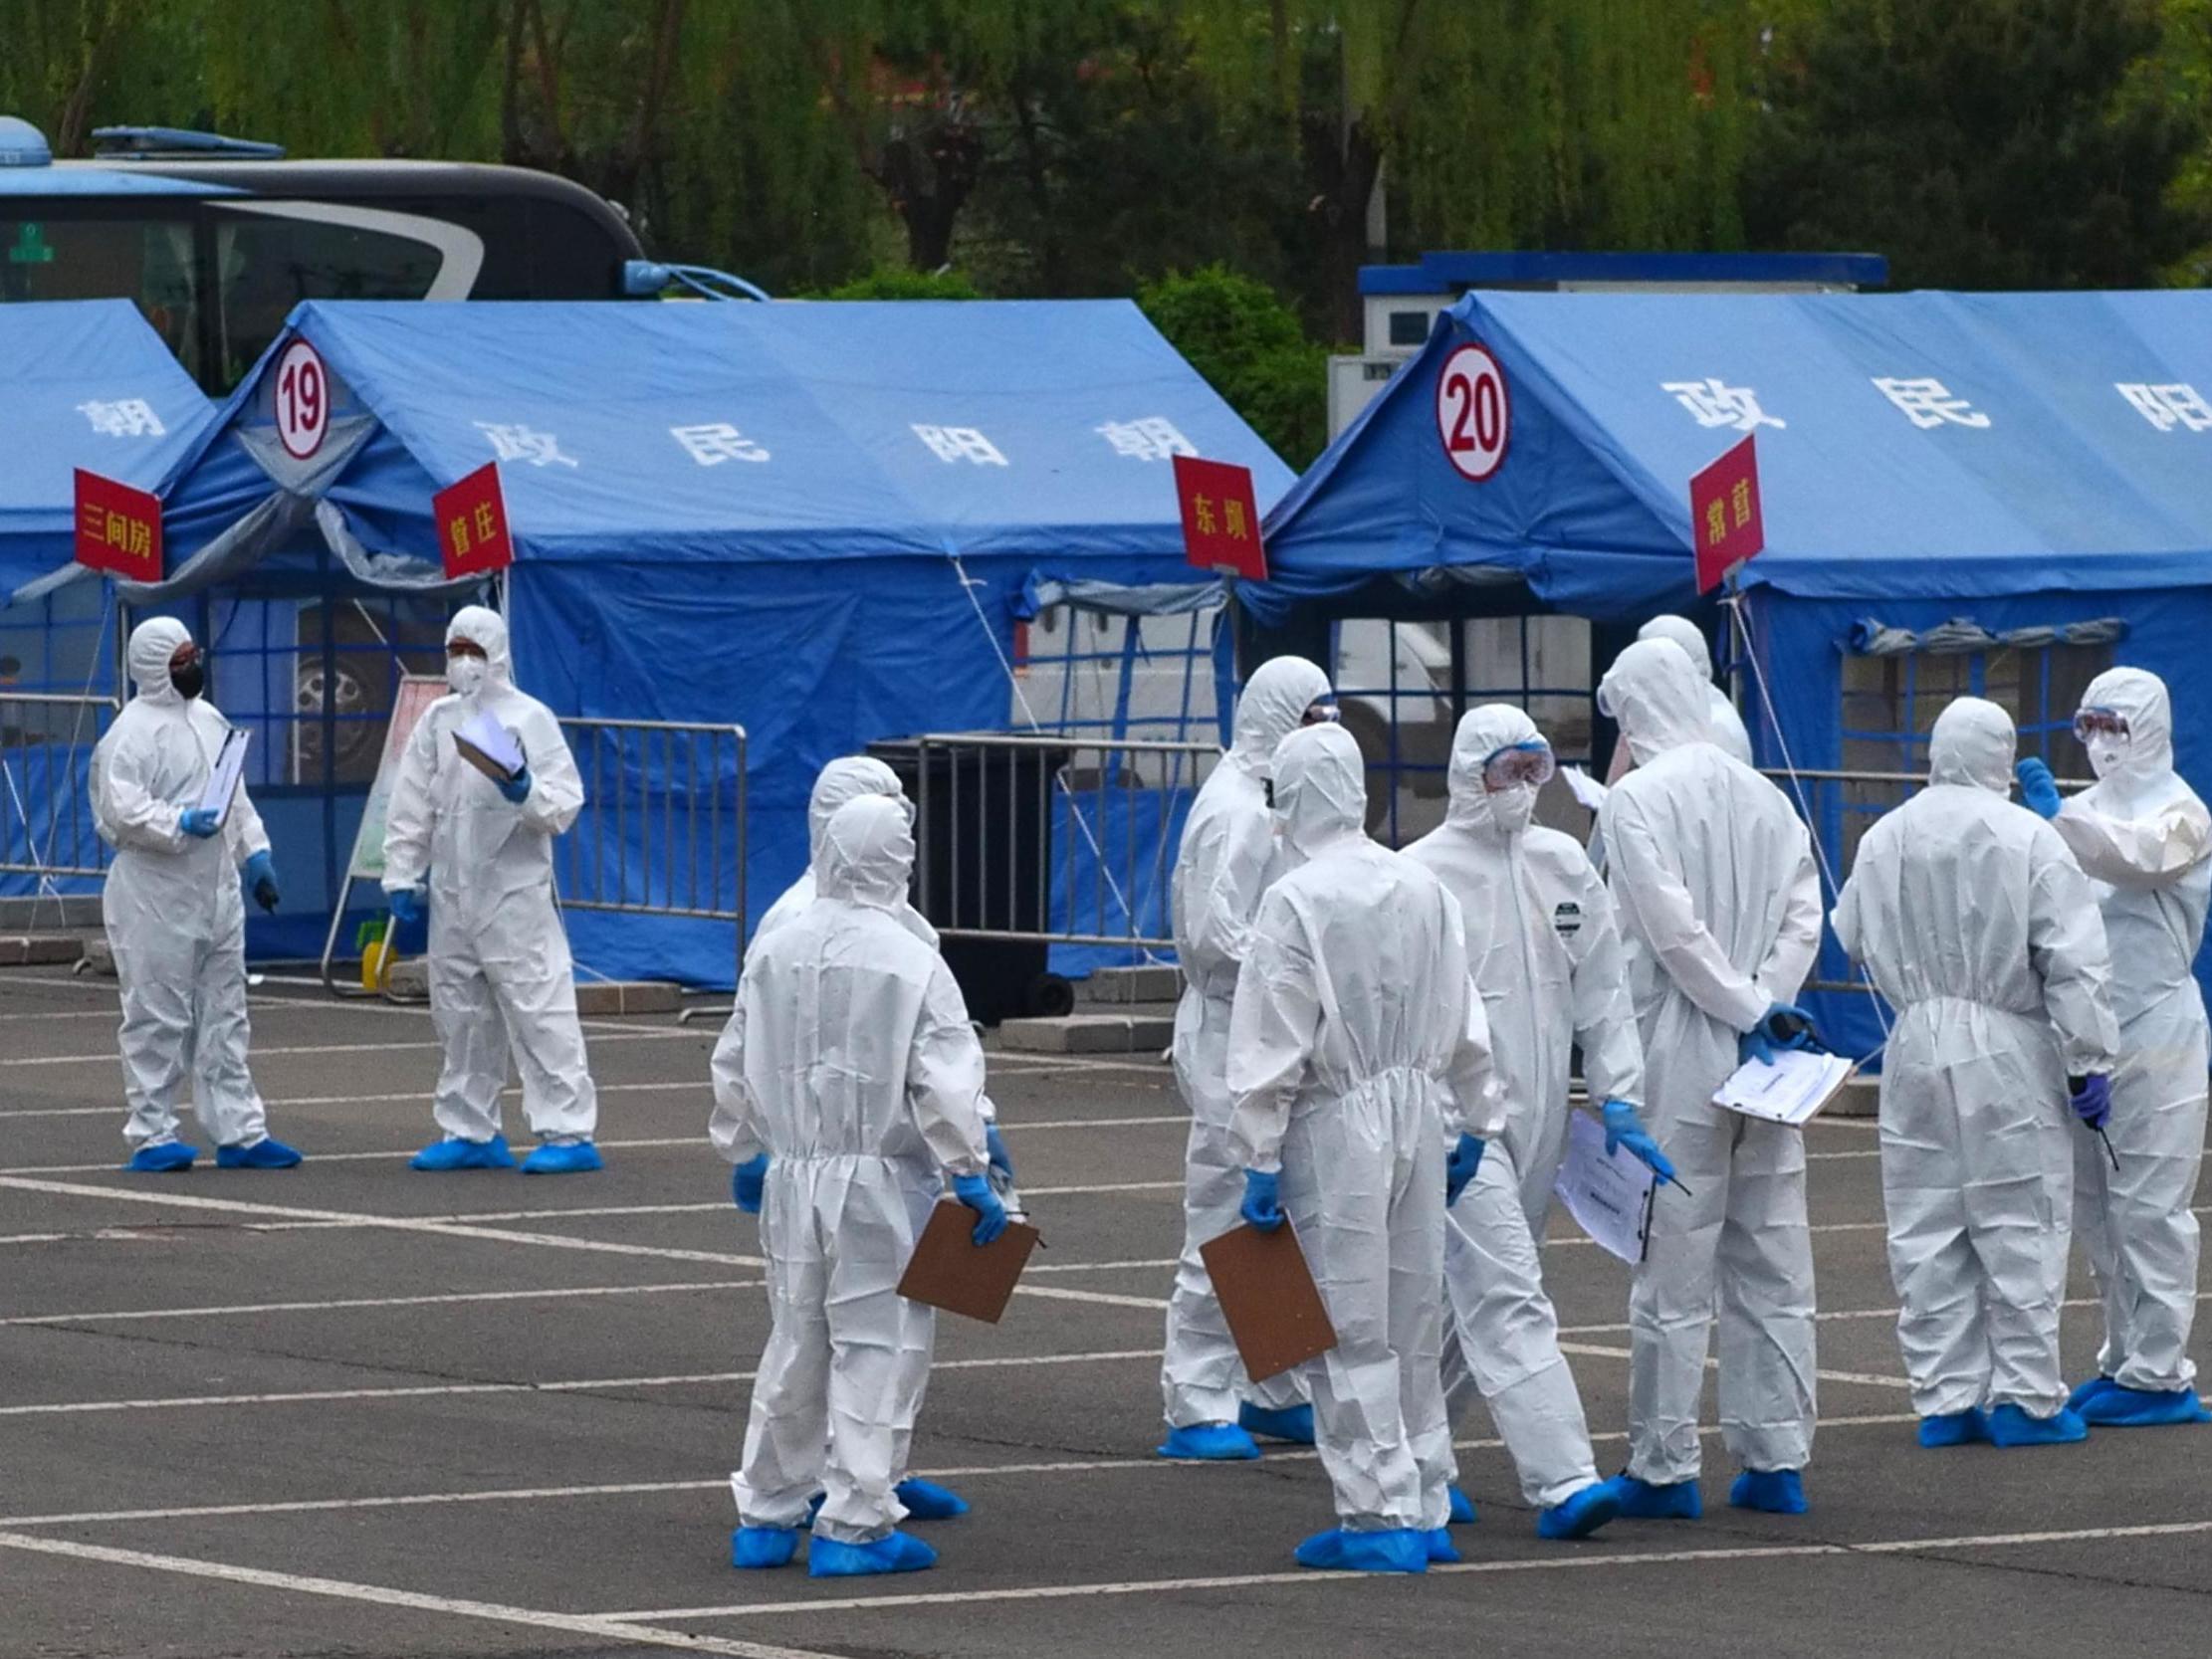 Coronavirus: China bans zombie game based on Covid-19 pandemic photo